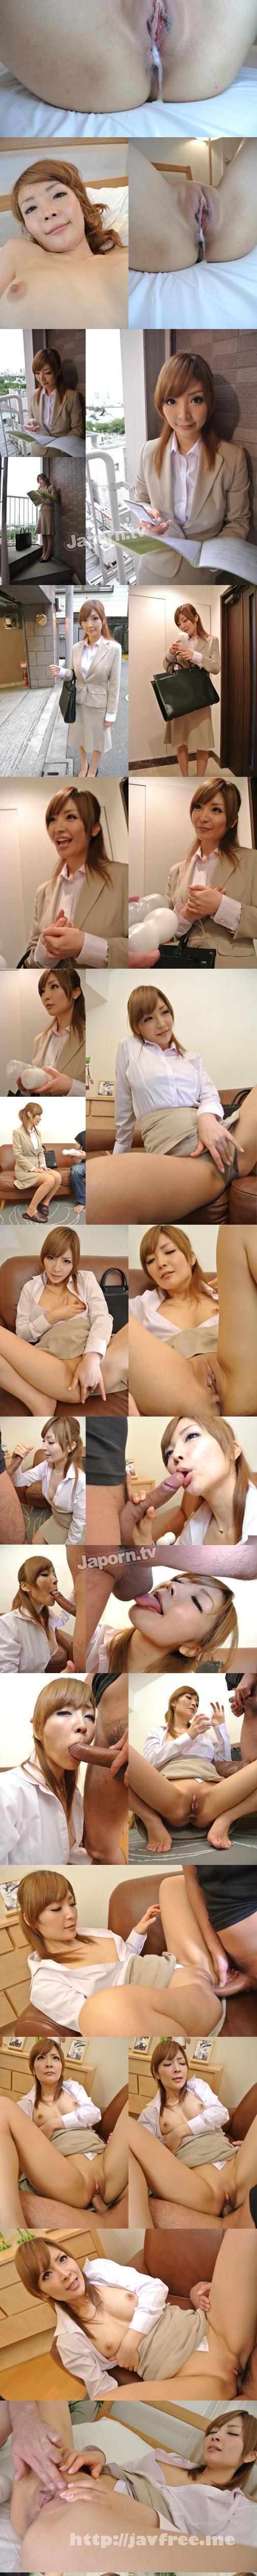 [HEY 017] 性のクッキングアイドル!! りおなちゃん : 鈴音りおな 鈴音りおな Riona Suzune HEY